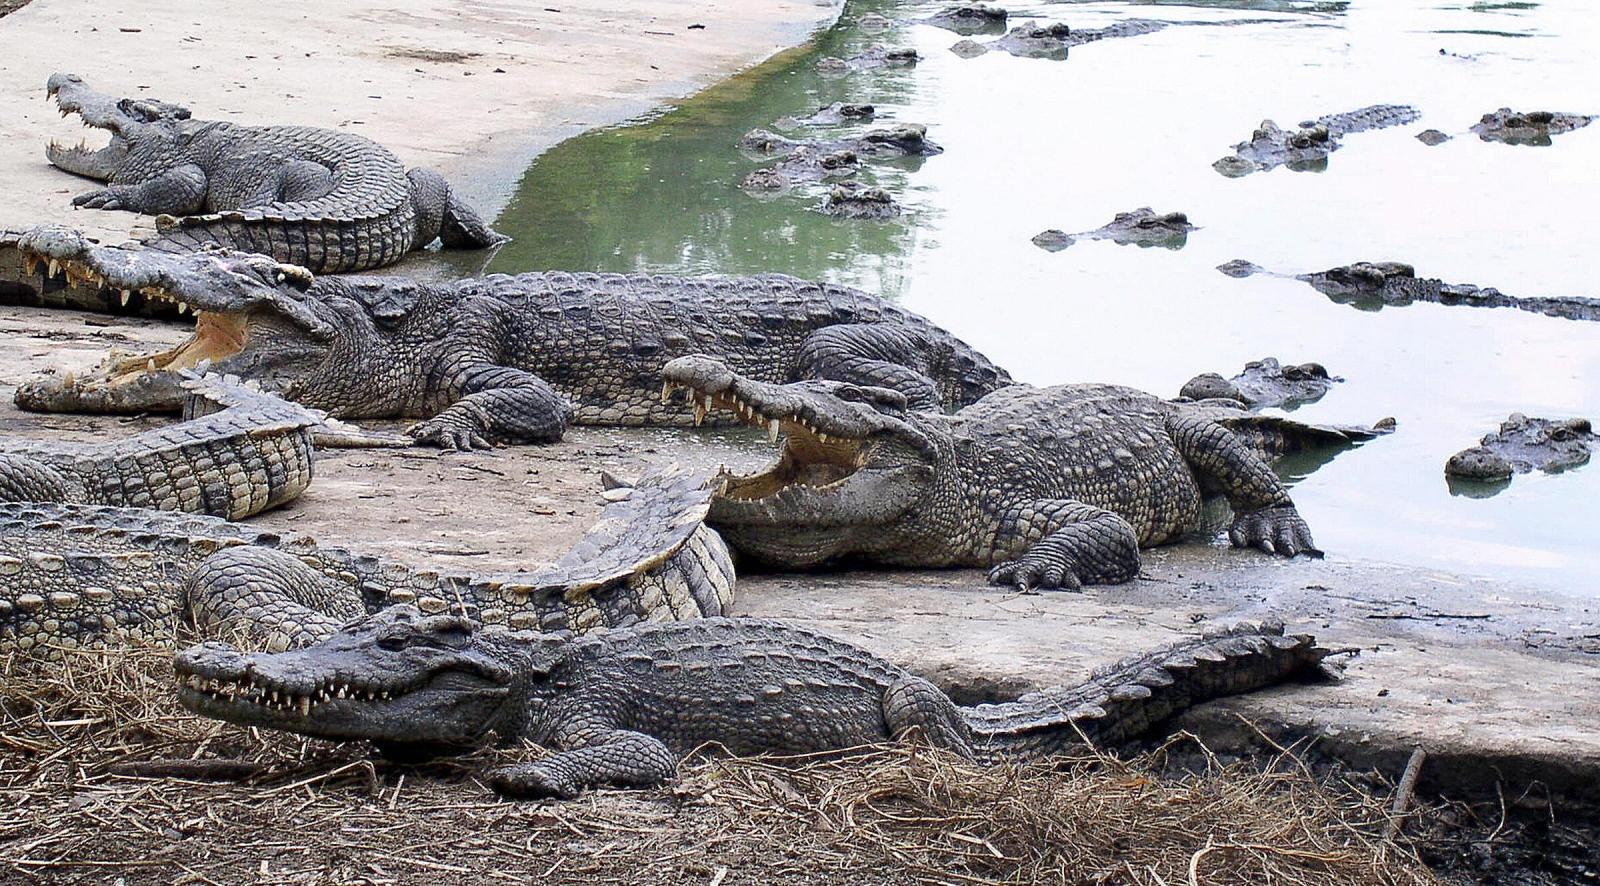 Wanpen Inyai was eaten alive by crocodiles at Bangkok Zoo in Thailand in suicide